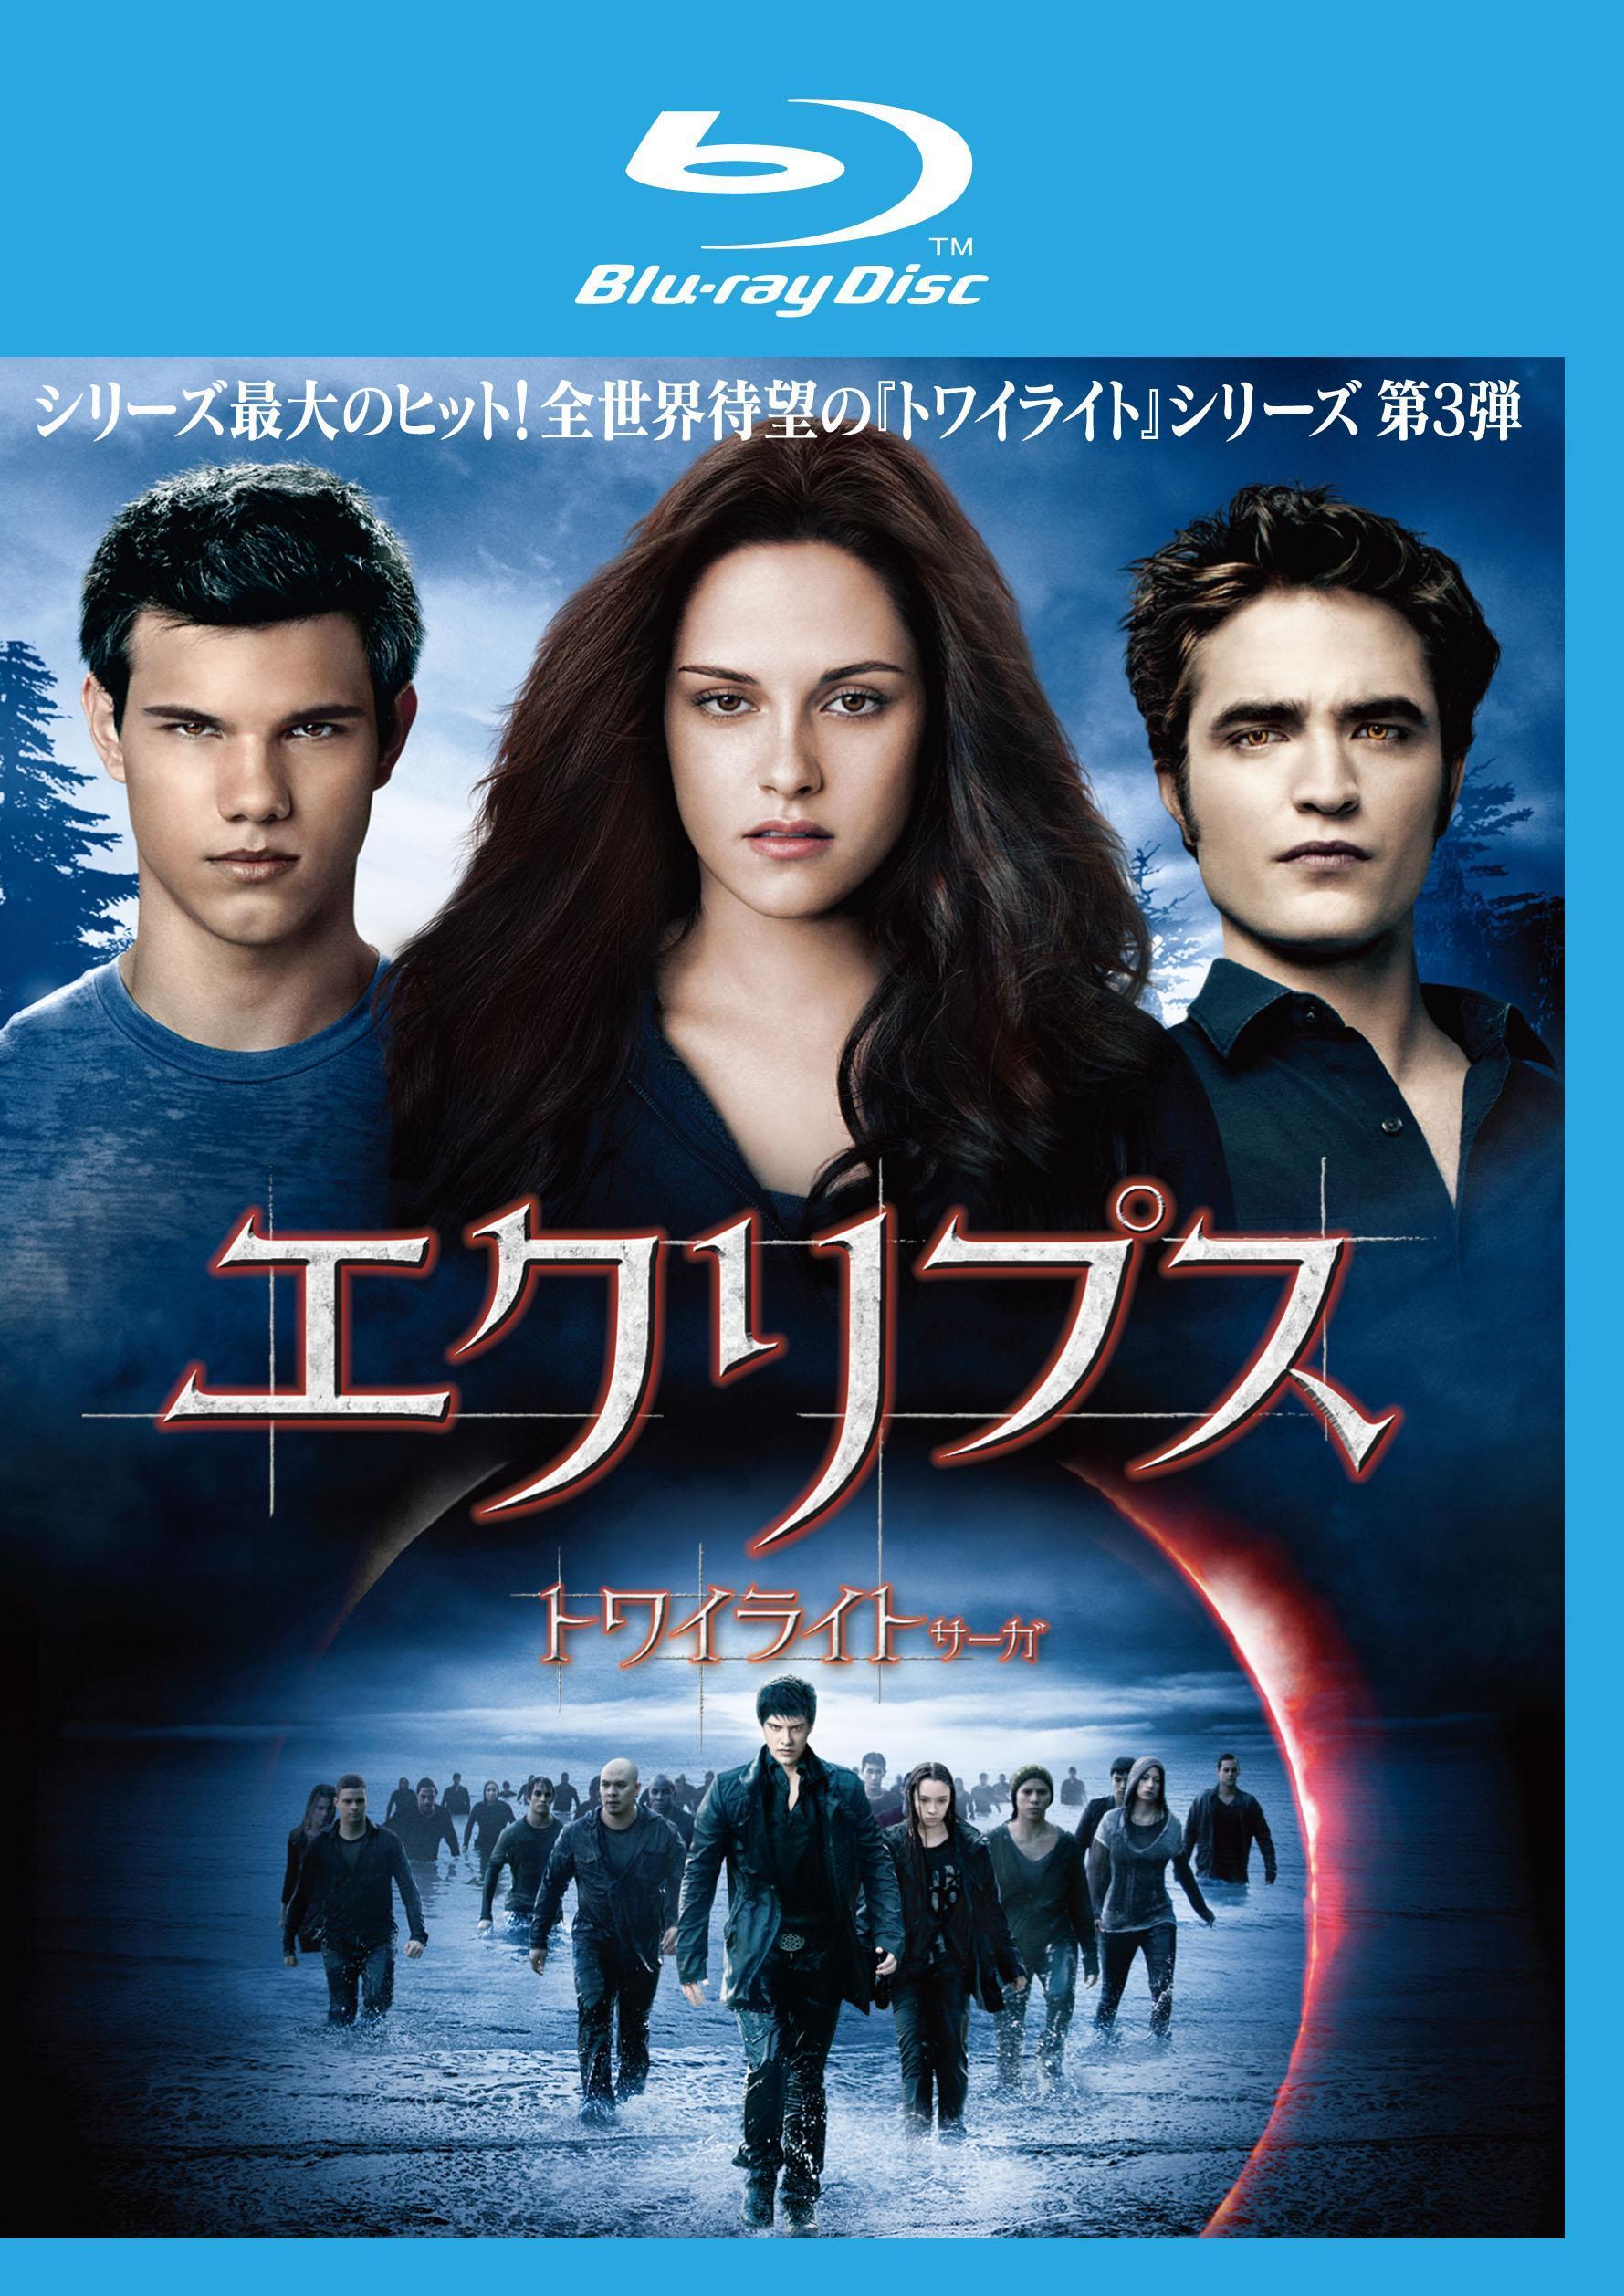 【Blu-ray】エクリプス/トワイライト・サーガ Blu-ray(ブルーレイ)